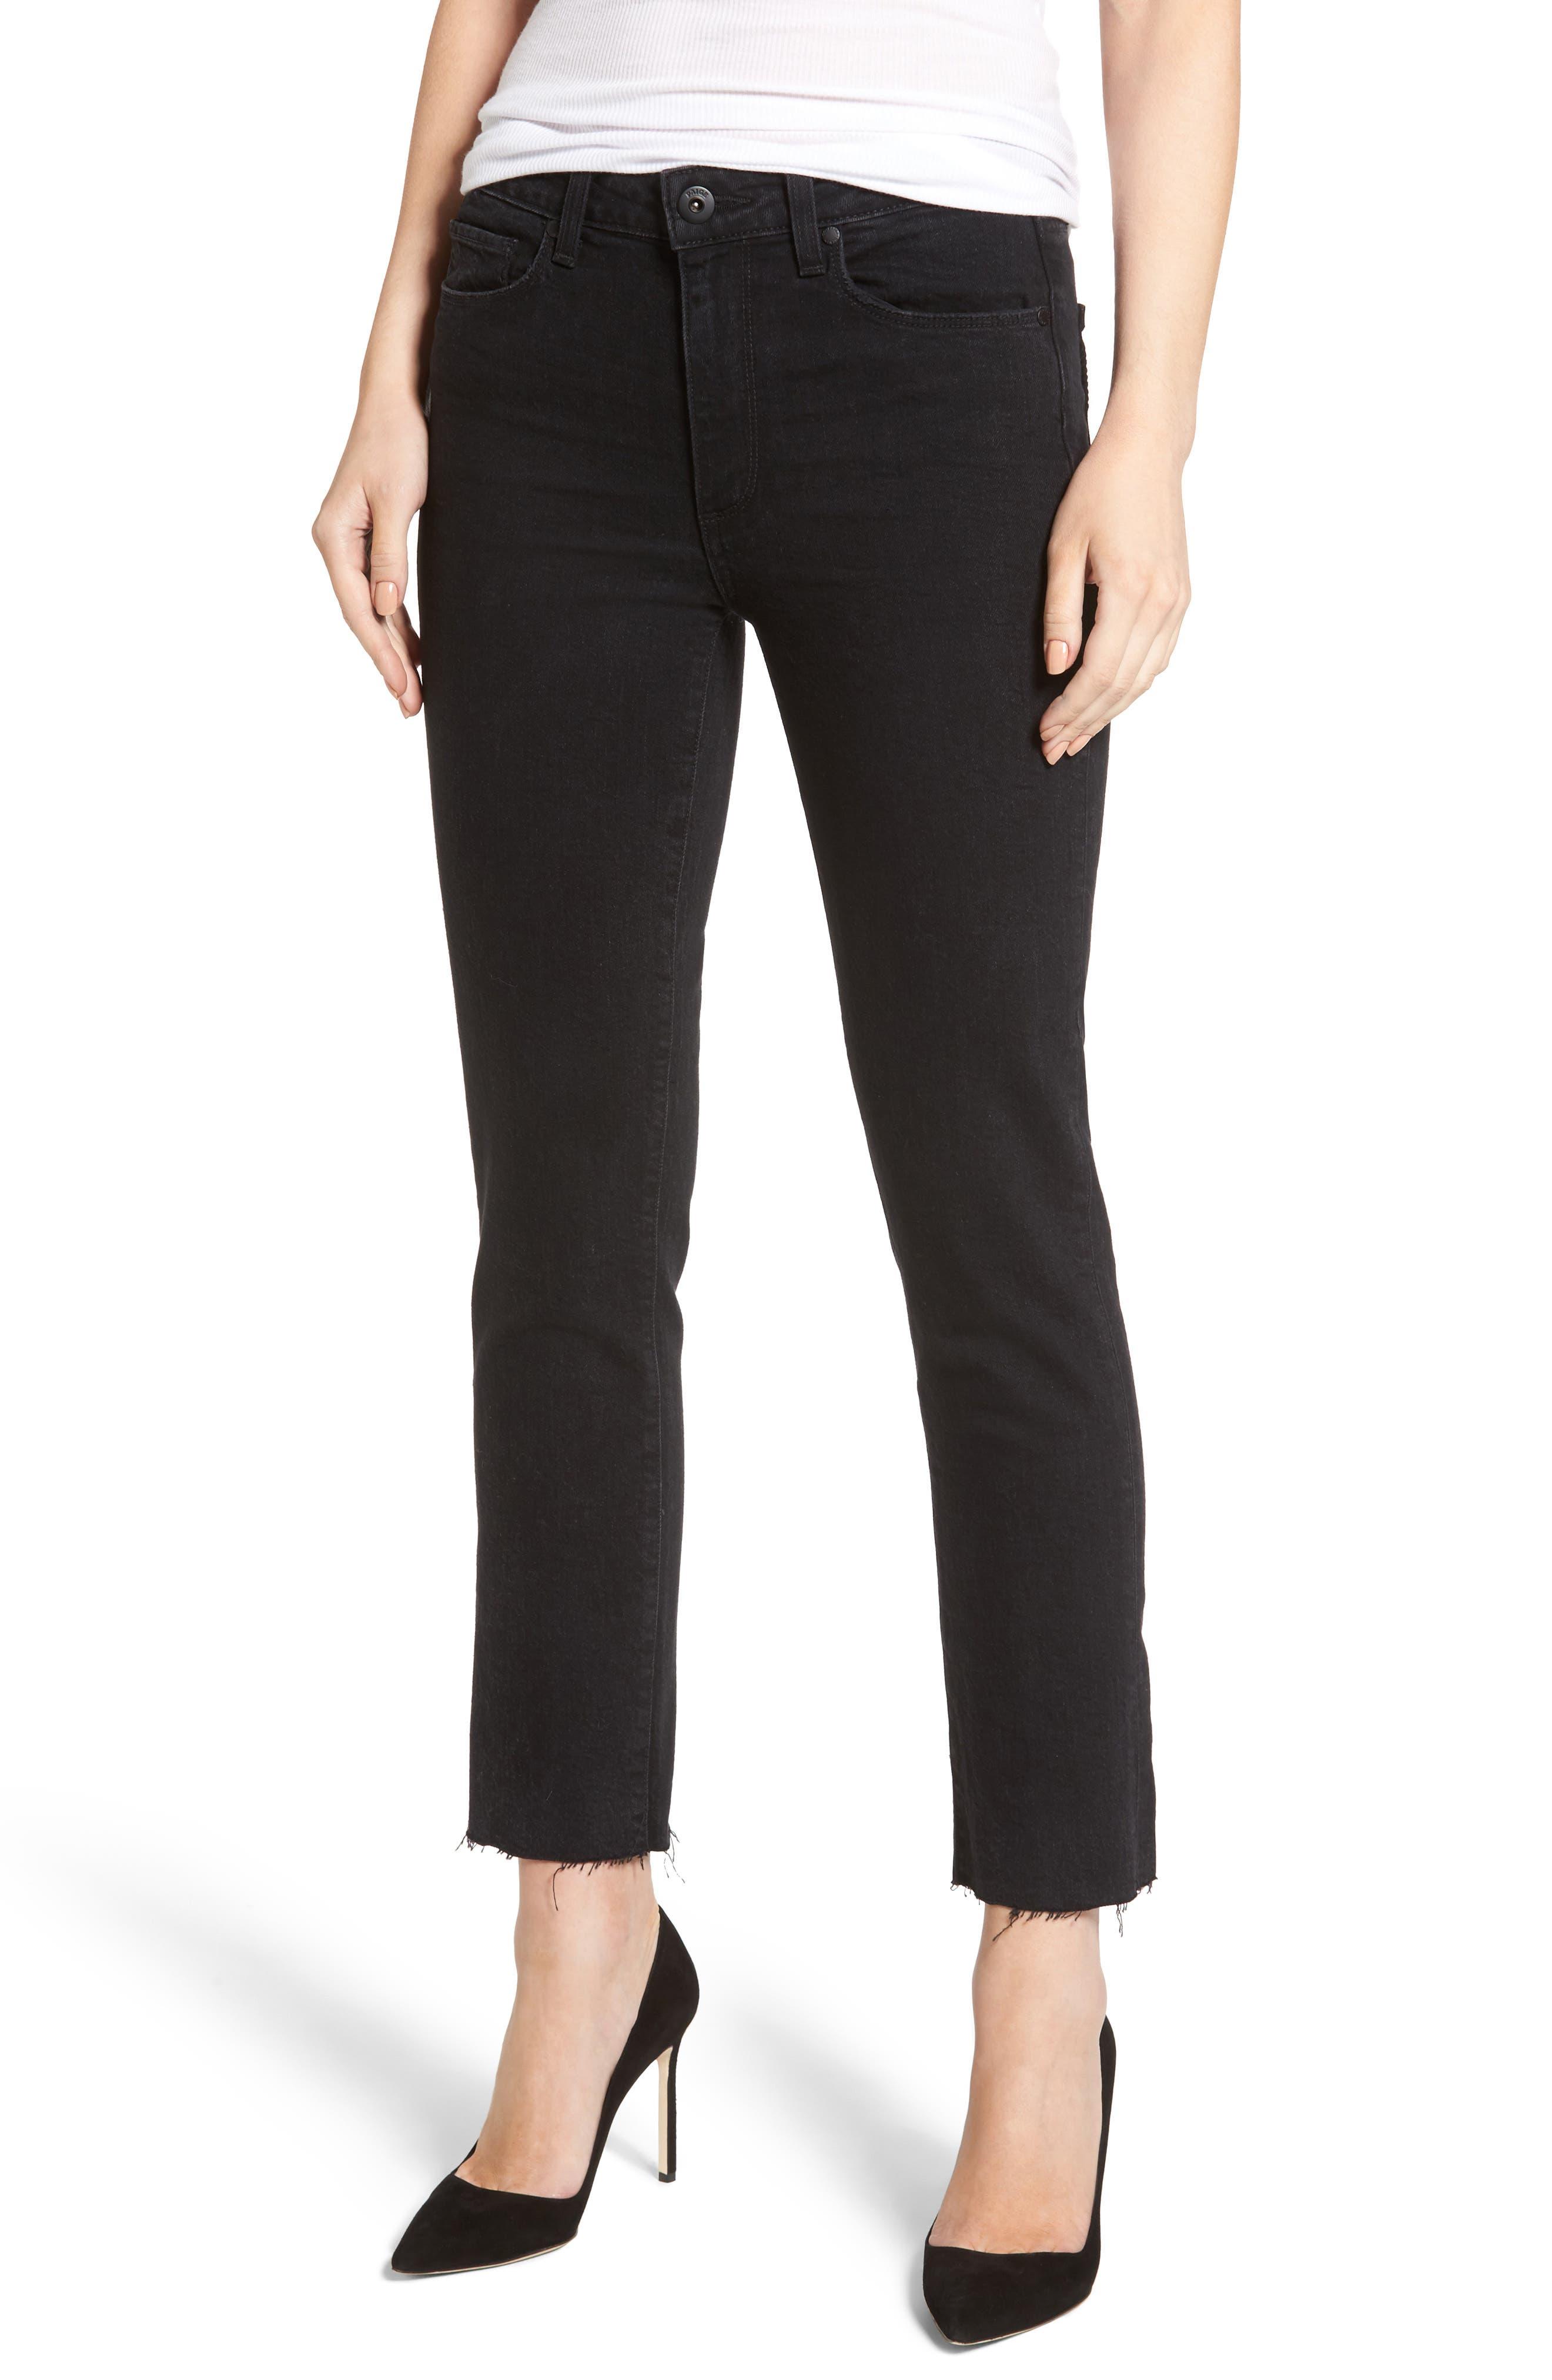 Alternate Image 1 Selected - PAIGE Jacqueline High Waist Crop Straight Leg Jeans (Riot)